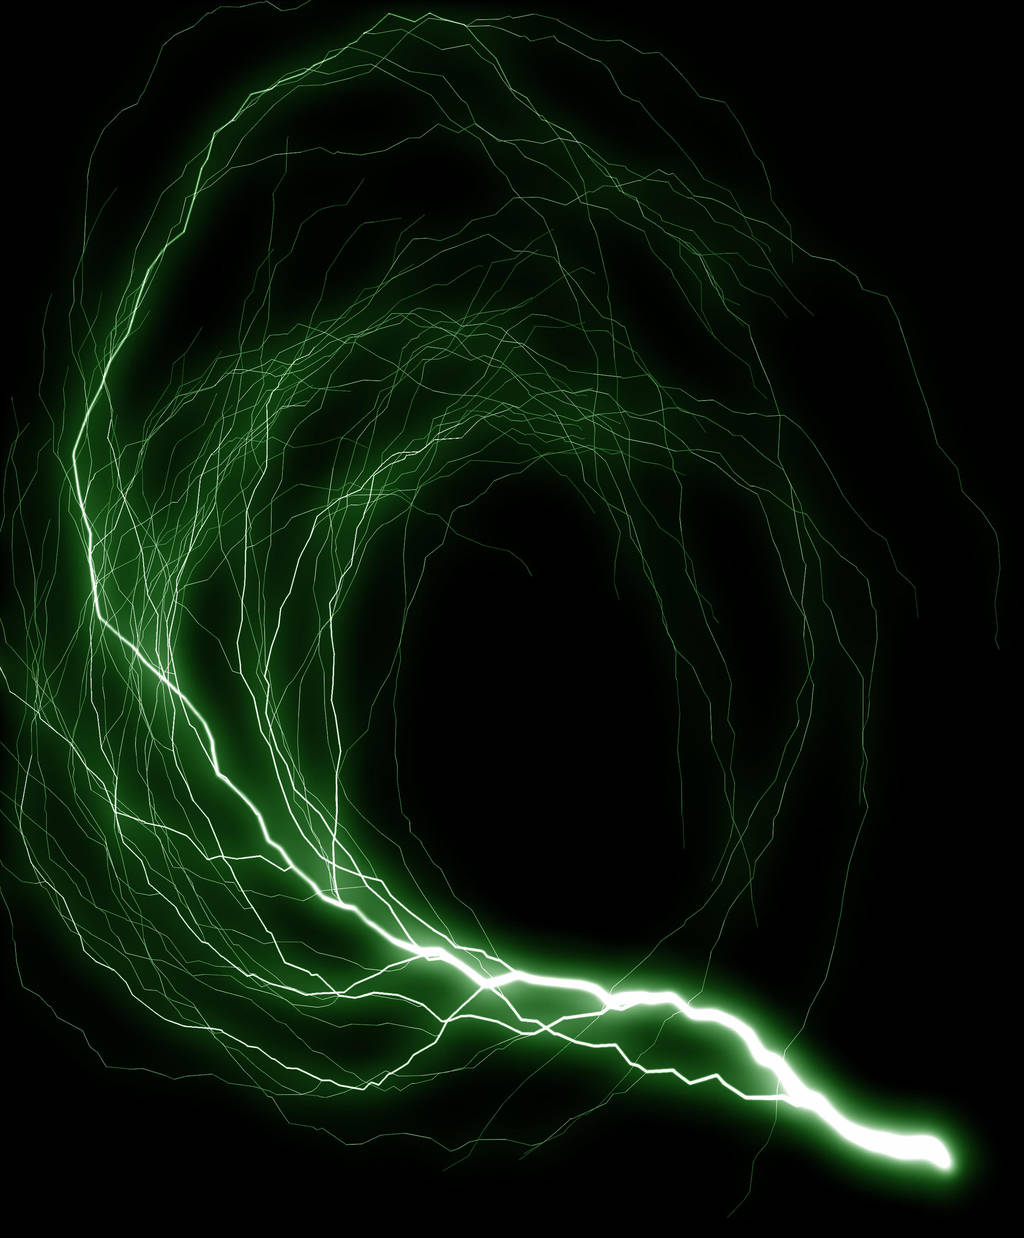 Lightning 1190 by zummerfish by zummerfish